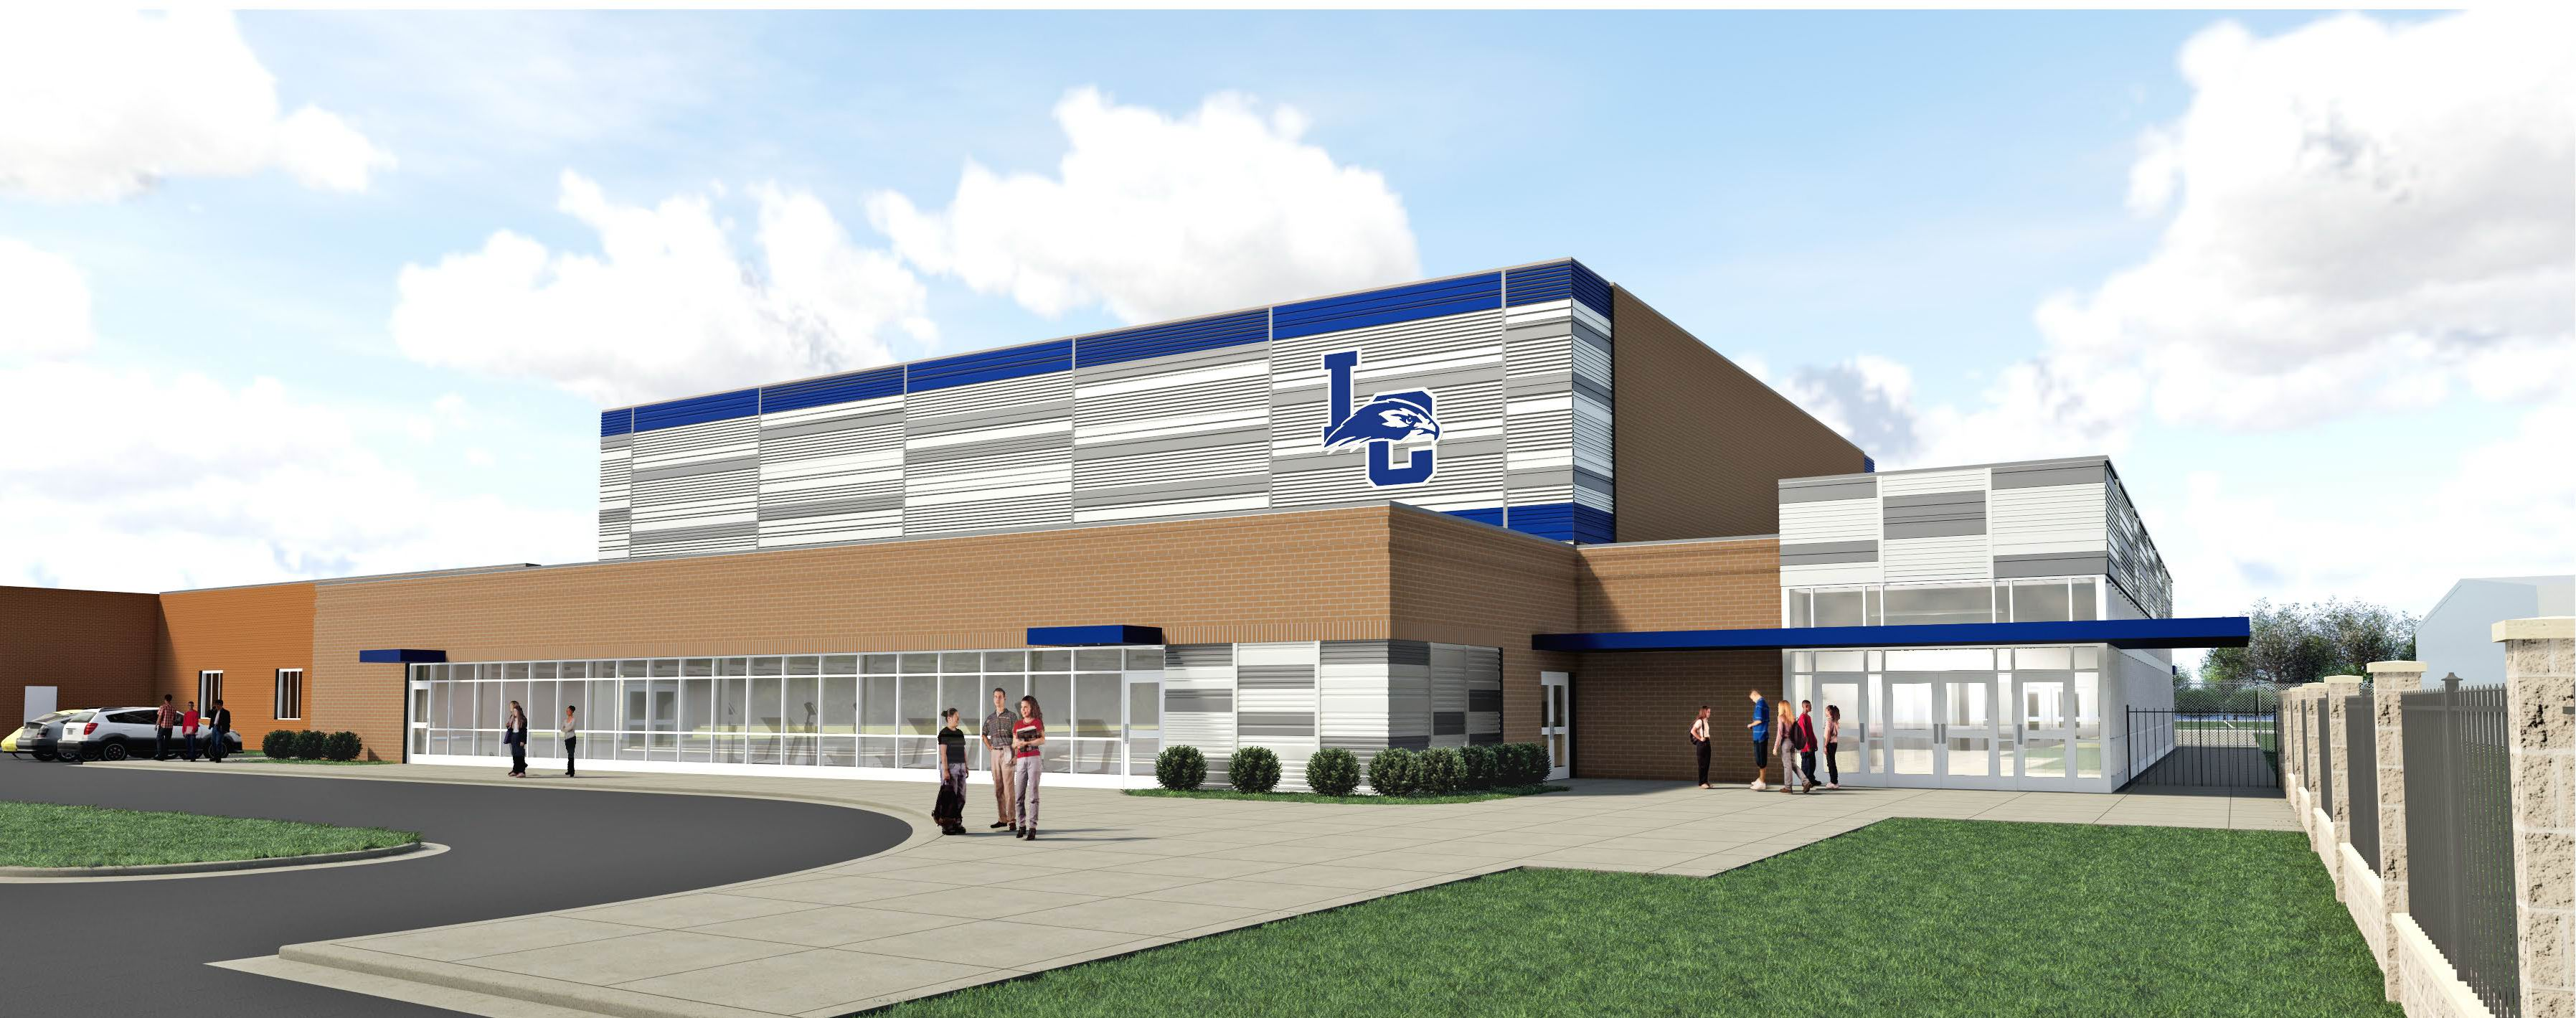 proposed new gymnasium